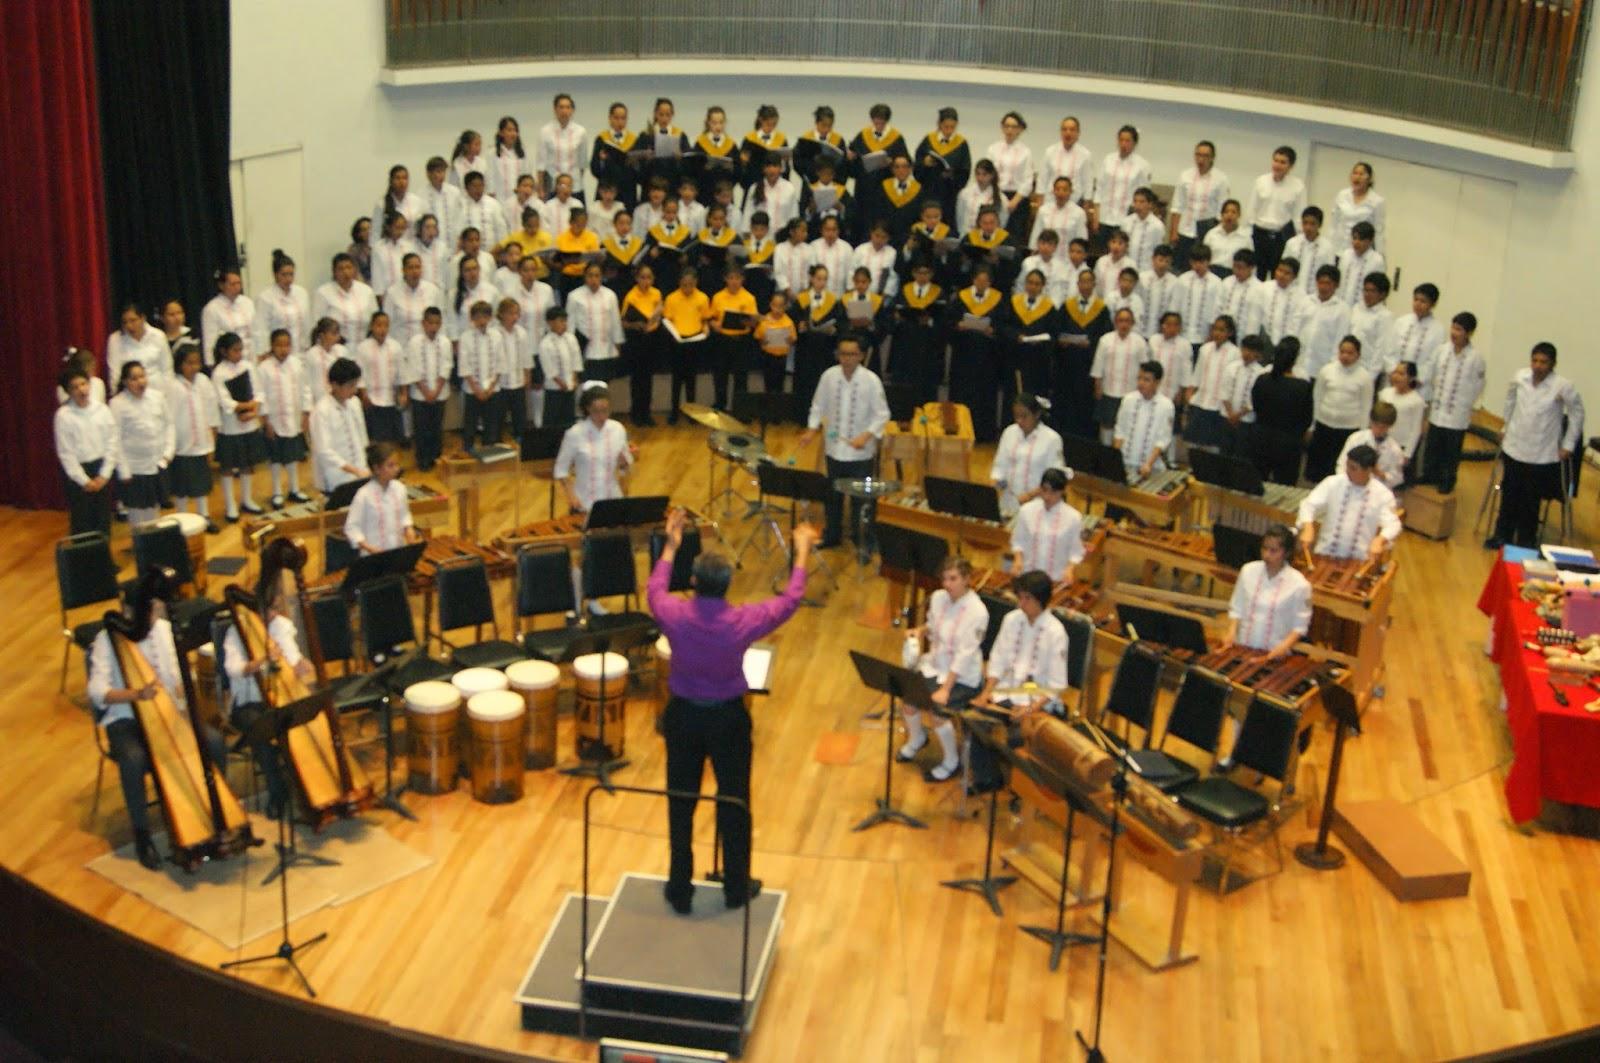 Gaceta artene c sar tort recibe homenaje en el for Conservatorio de musica